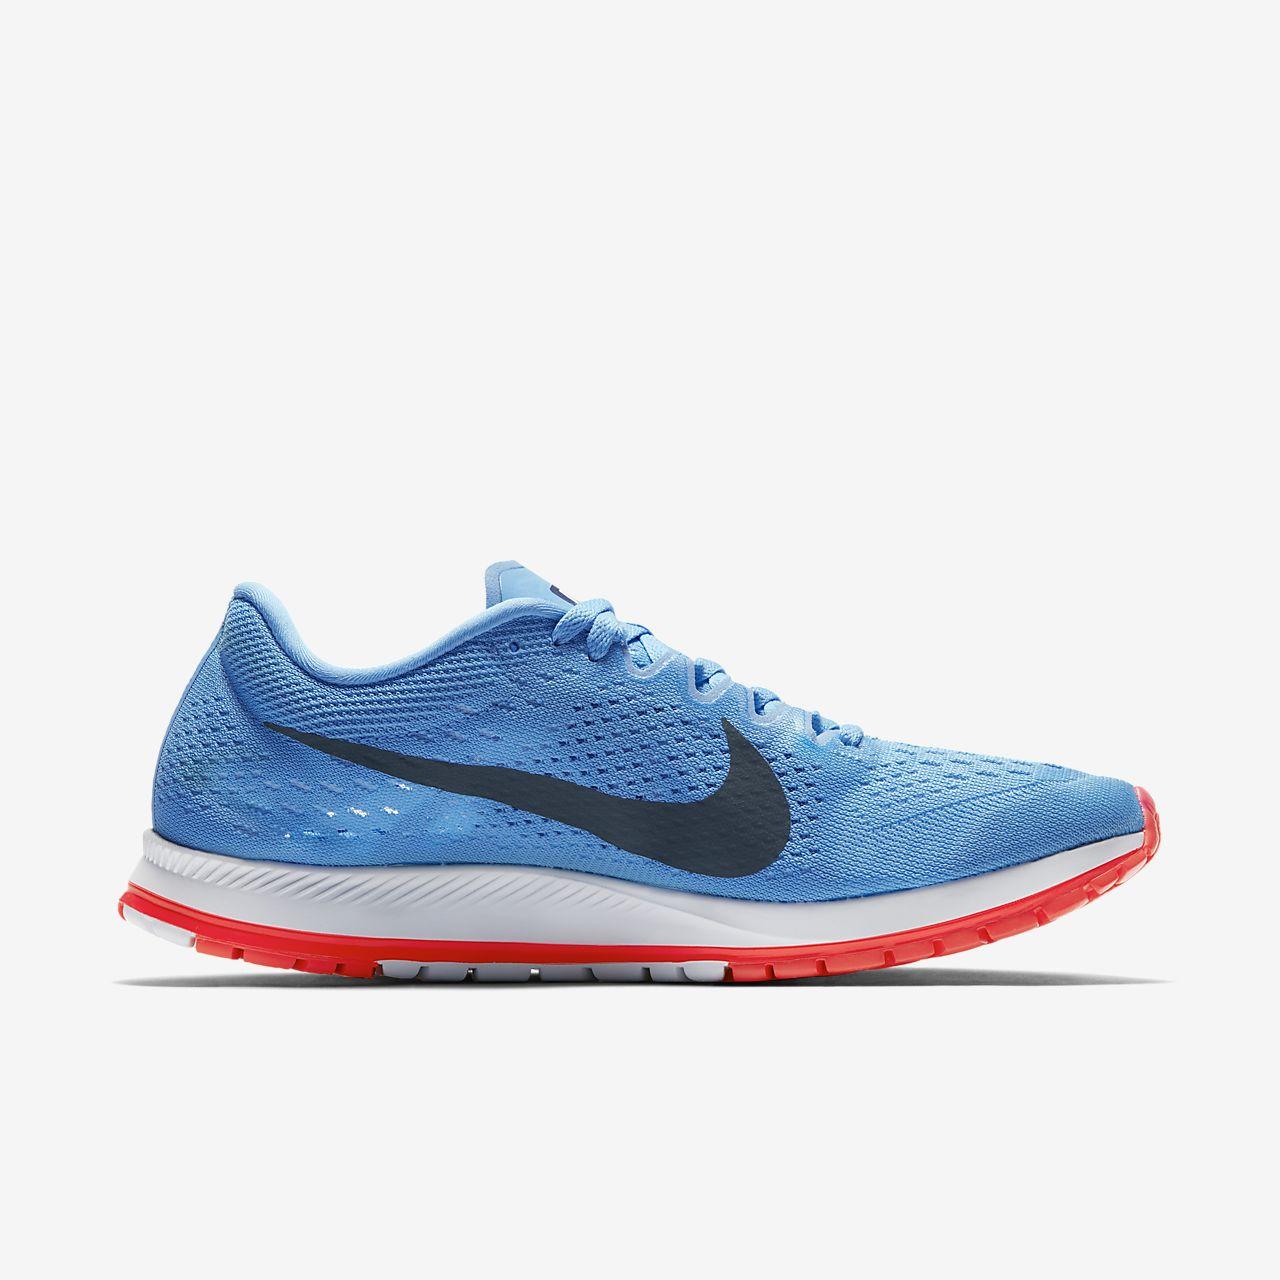 Nike Mens Racing Shoes